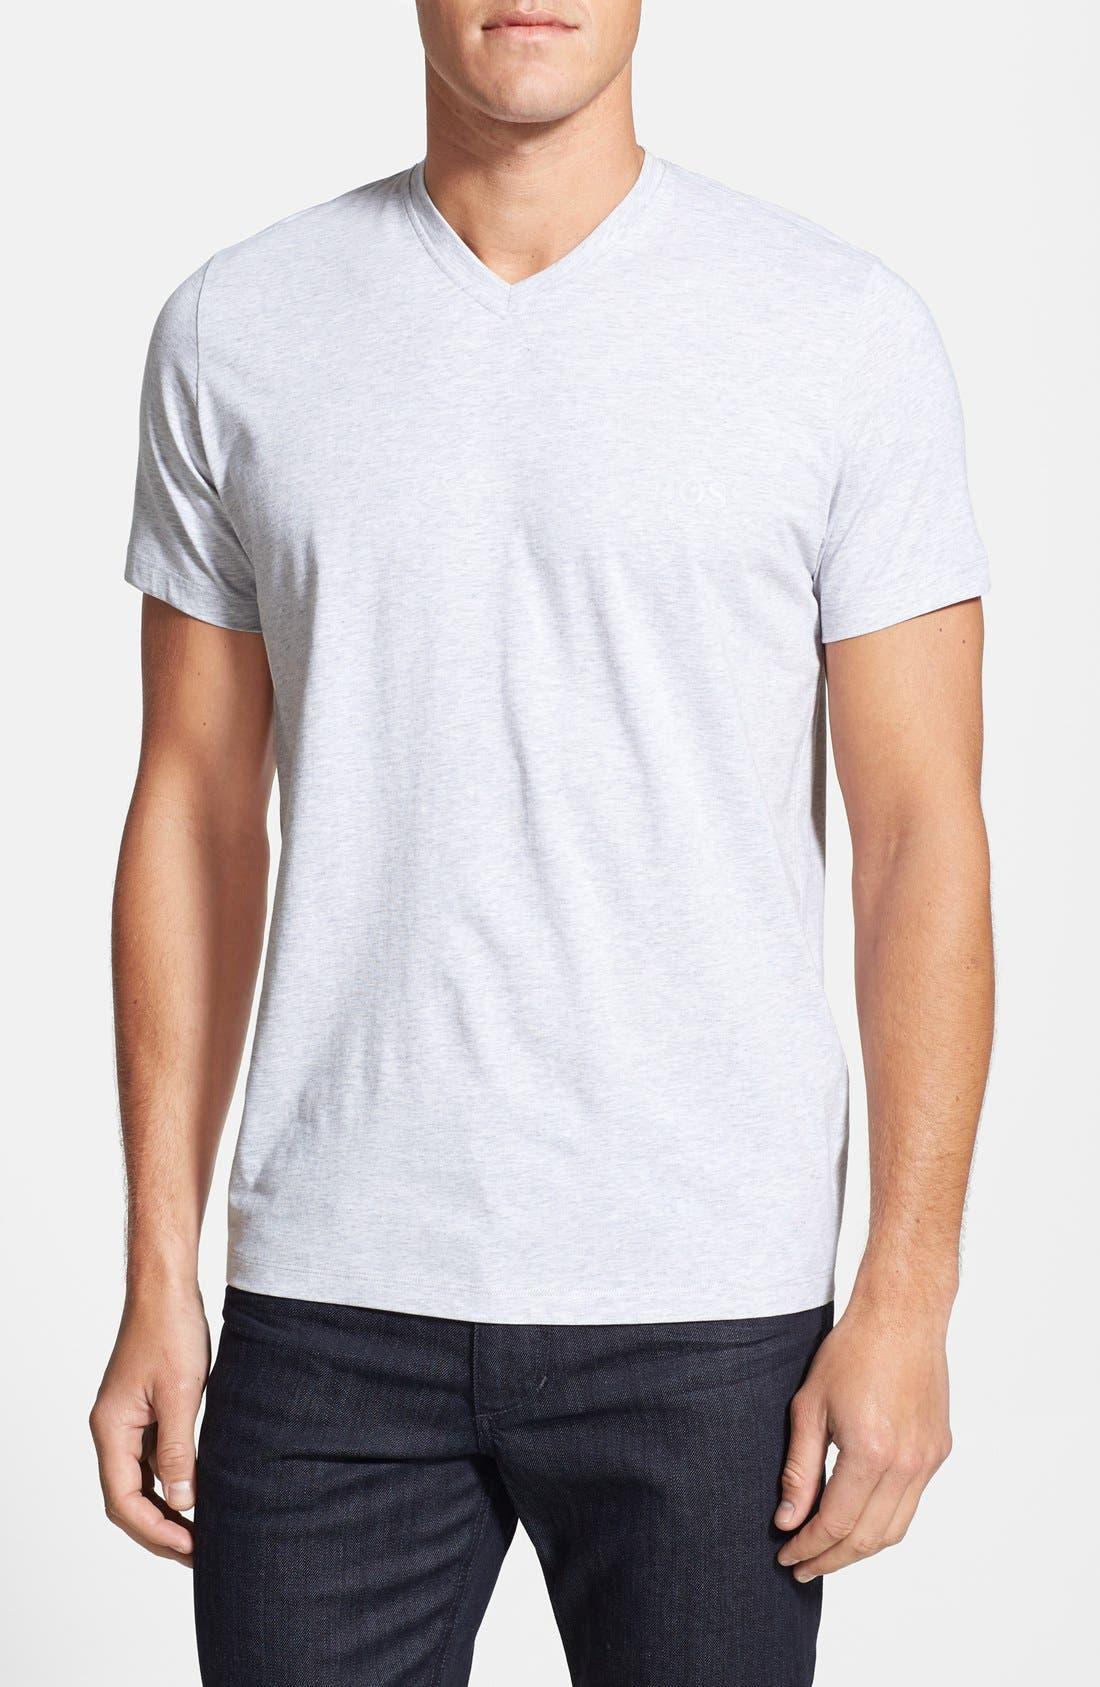 Main Image - BOSS HUGO BOSS 'Innovation 1' V-Neck T-Shirt